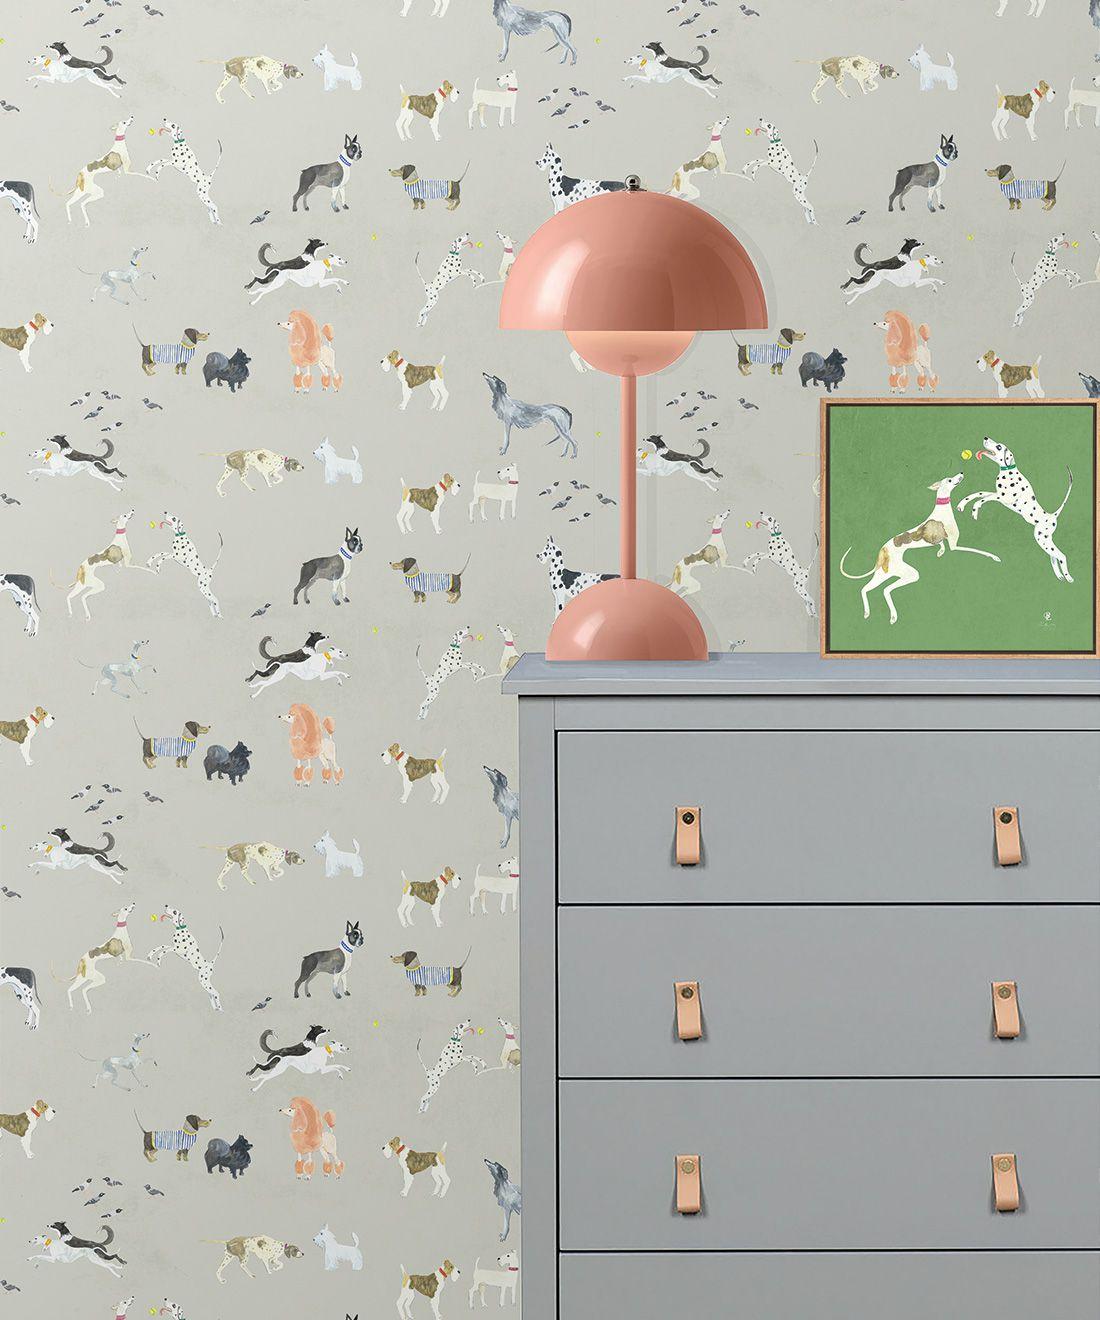 Doggies Wallpaper •Dog Wallpaper •Beige • Insitu with dresser and lamp